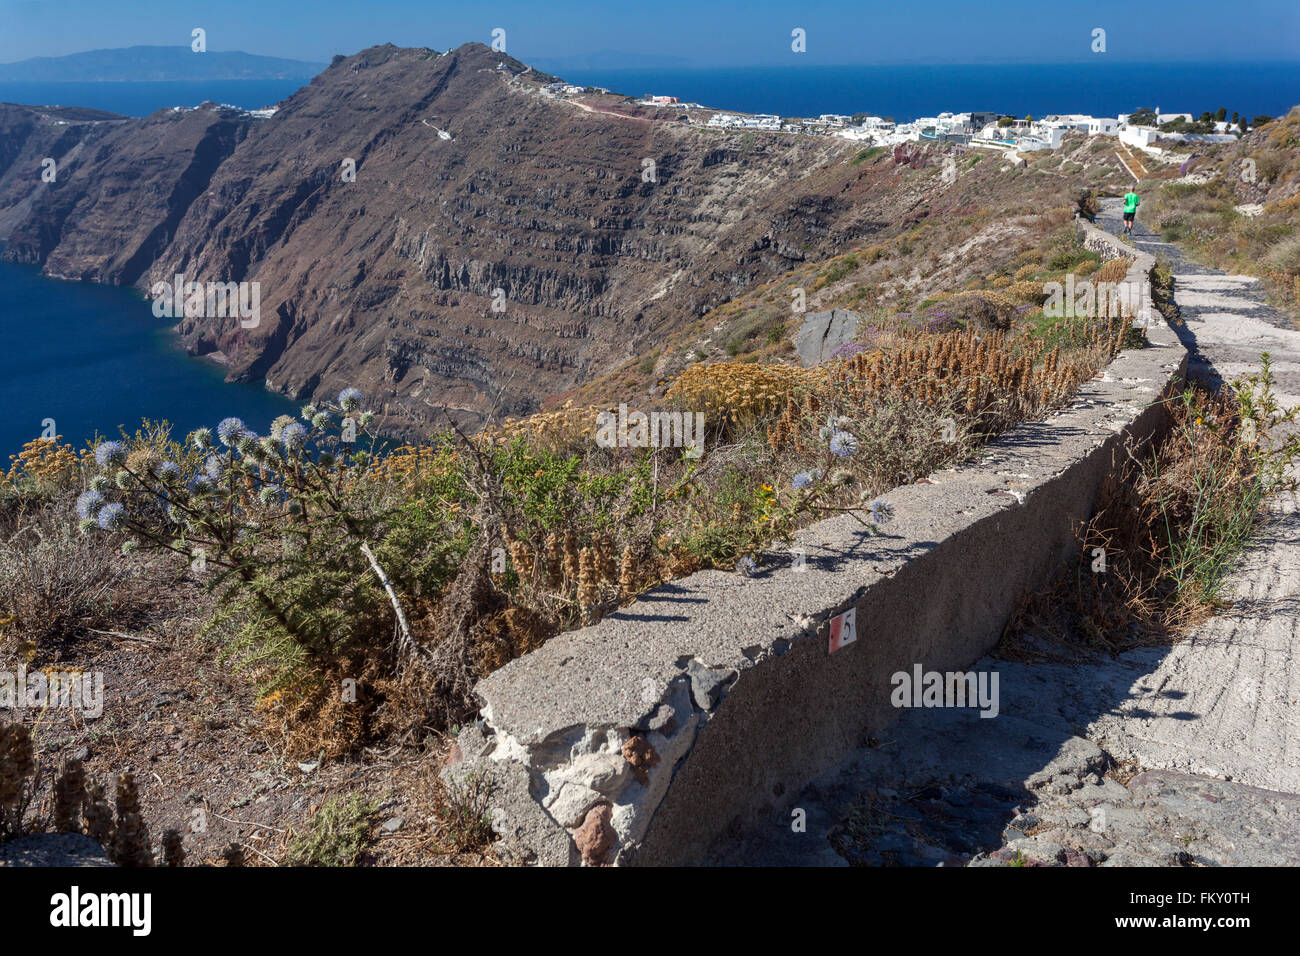 The path from Imerovigli to Oia, Santorini, Greek Islands, Cyclades, Greece - Stock Image